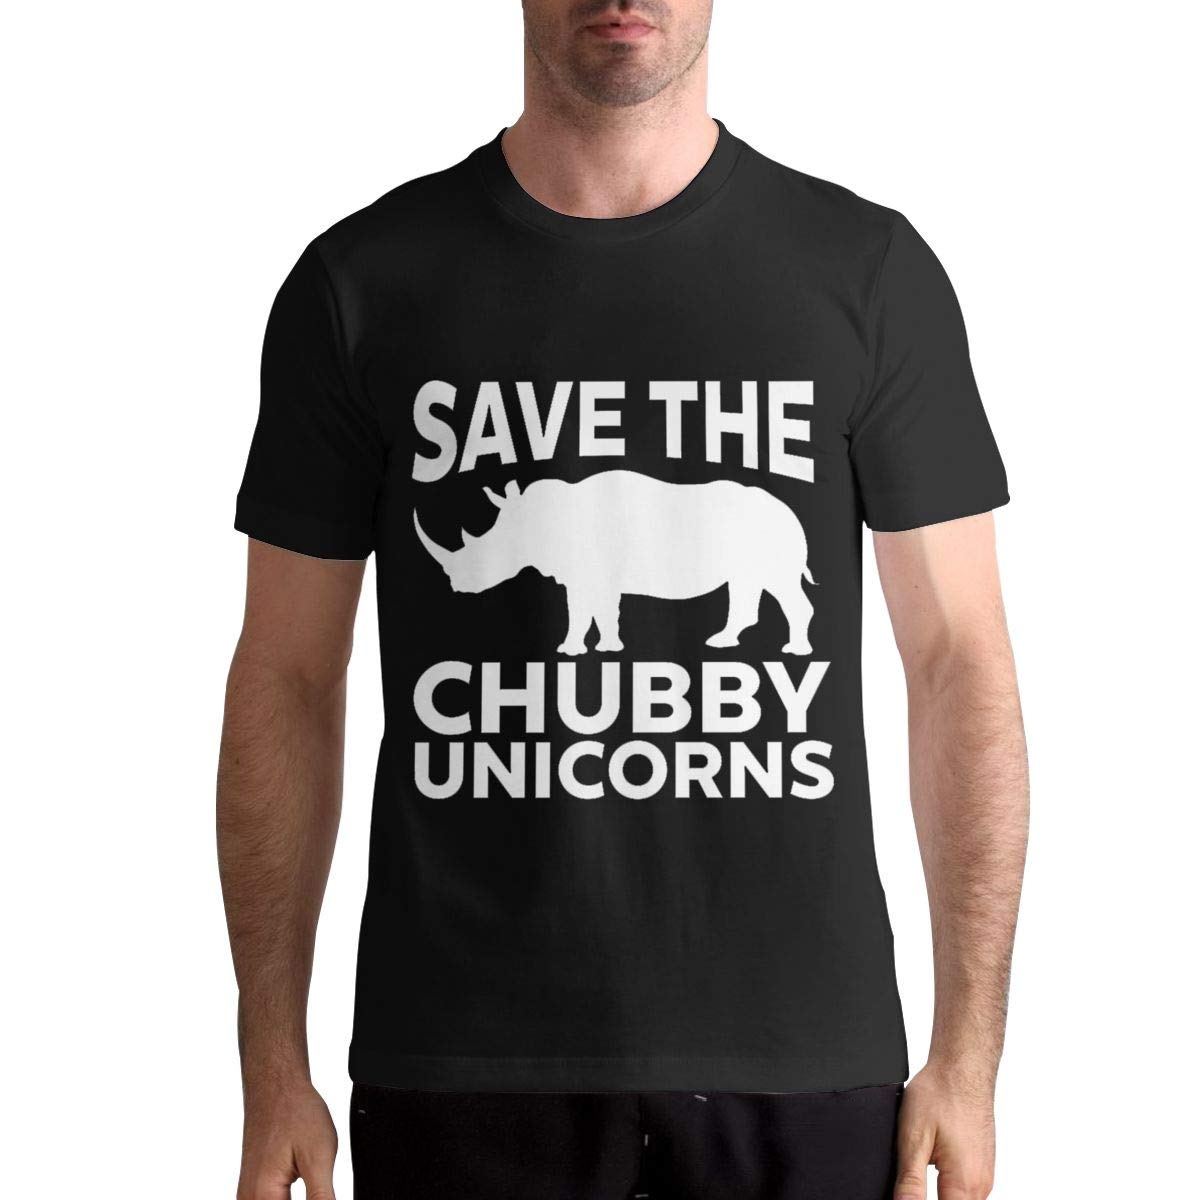 DANIELBURTON Cool Save The Chubby Unicorn Mens Black T-Shirt Top Tees Short Sleeve Shirts